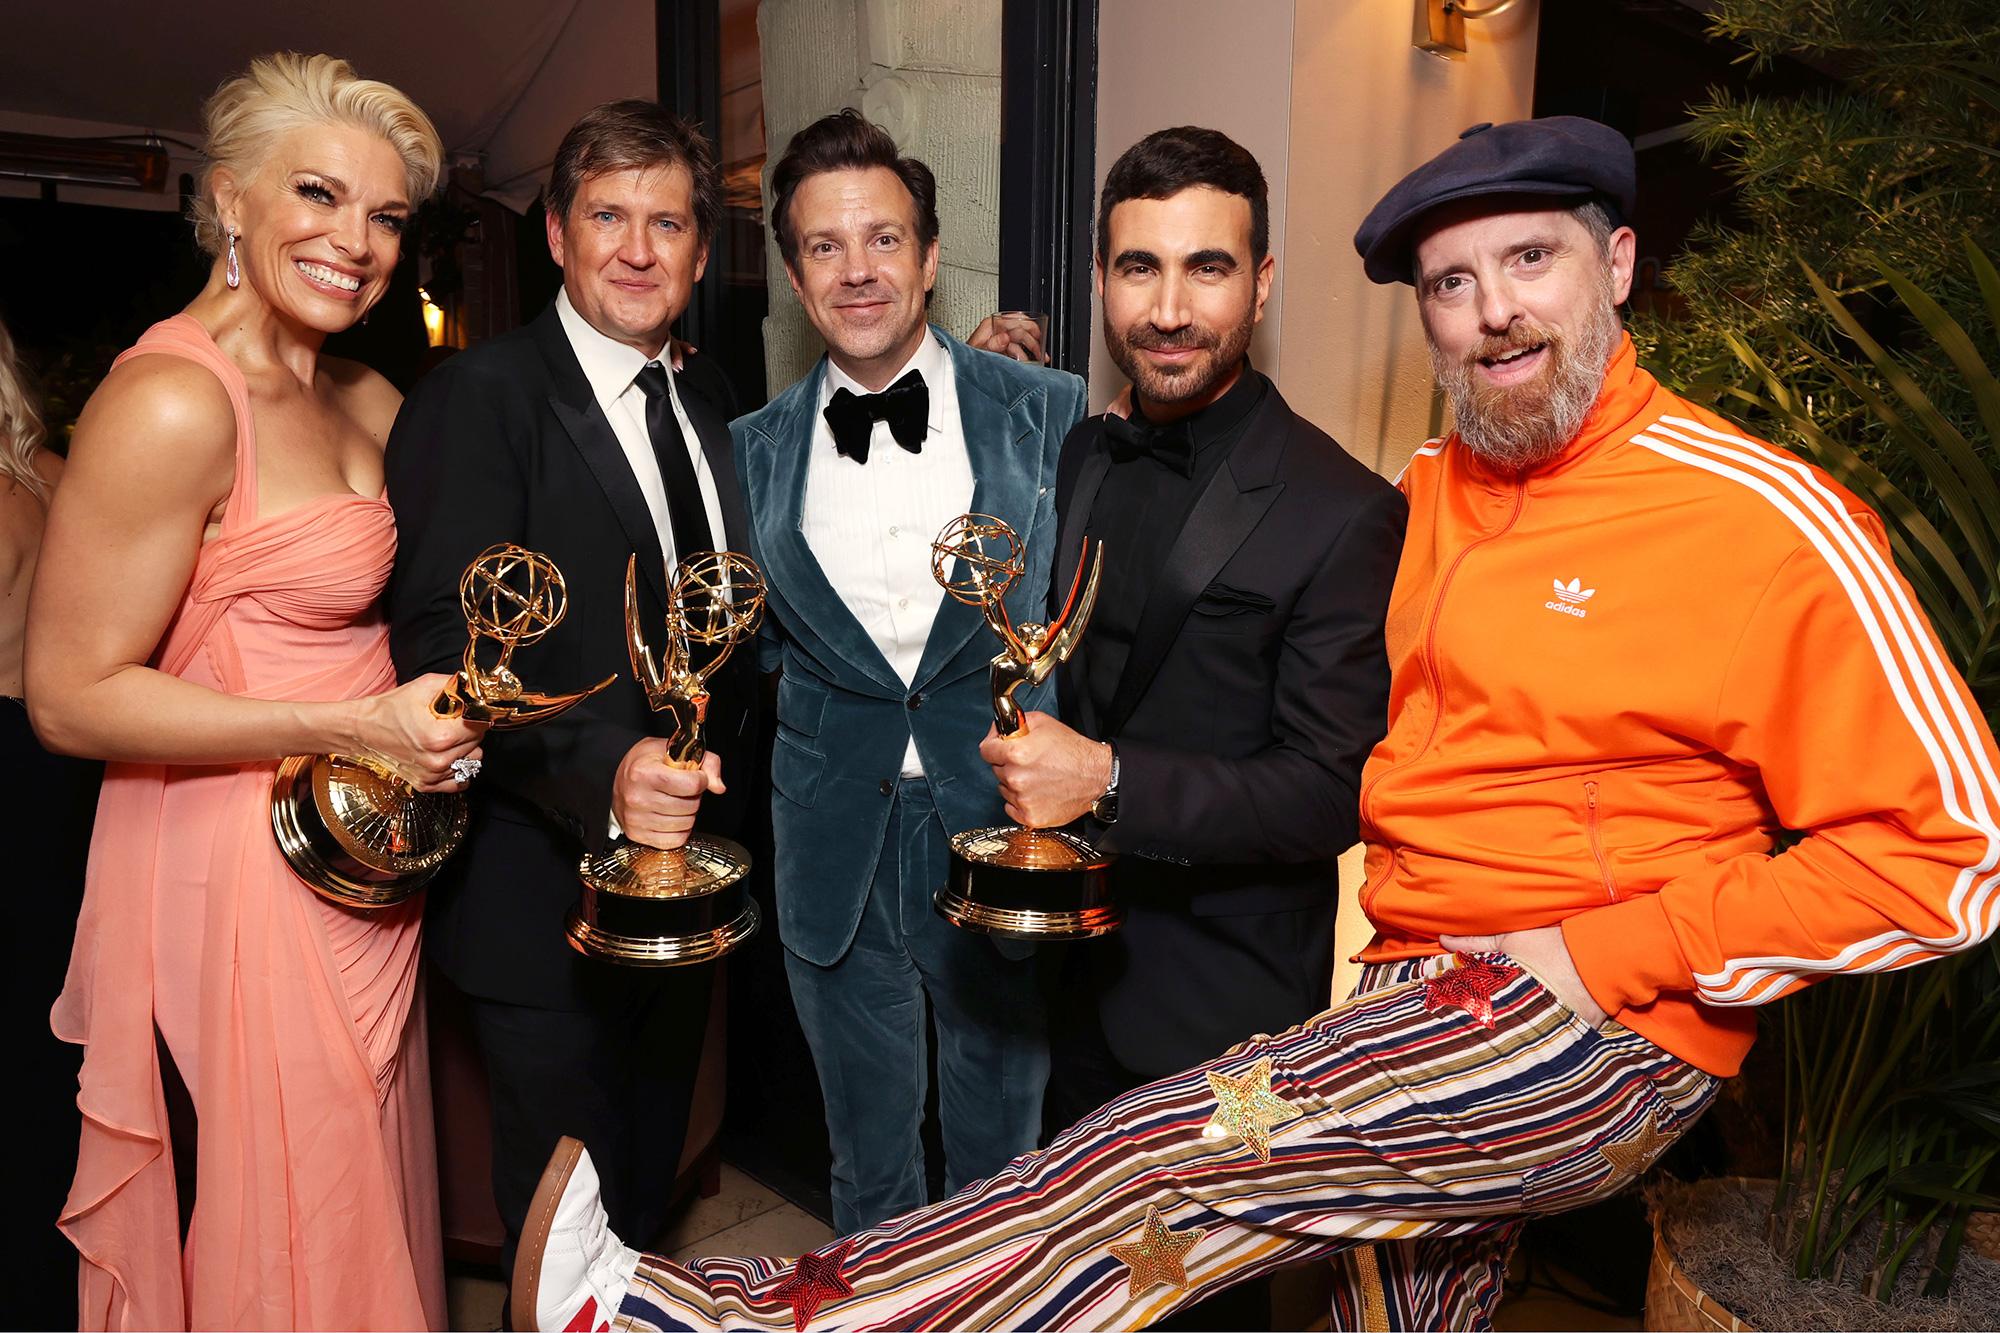 Ted Lasso Emmy Awards Party Hannah Waddingham, Bill Lawrence, Jason Sudeikis, Brett Goldstein, Brendan Hunt